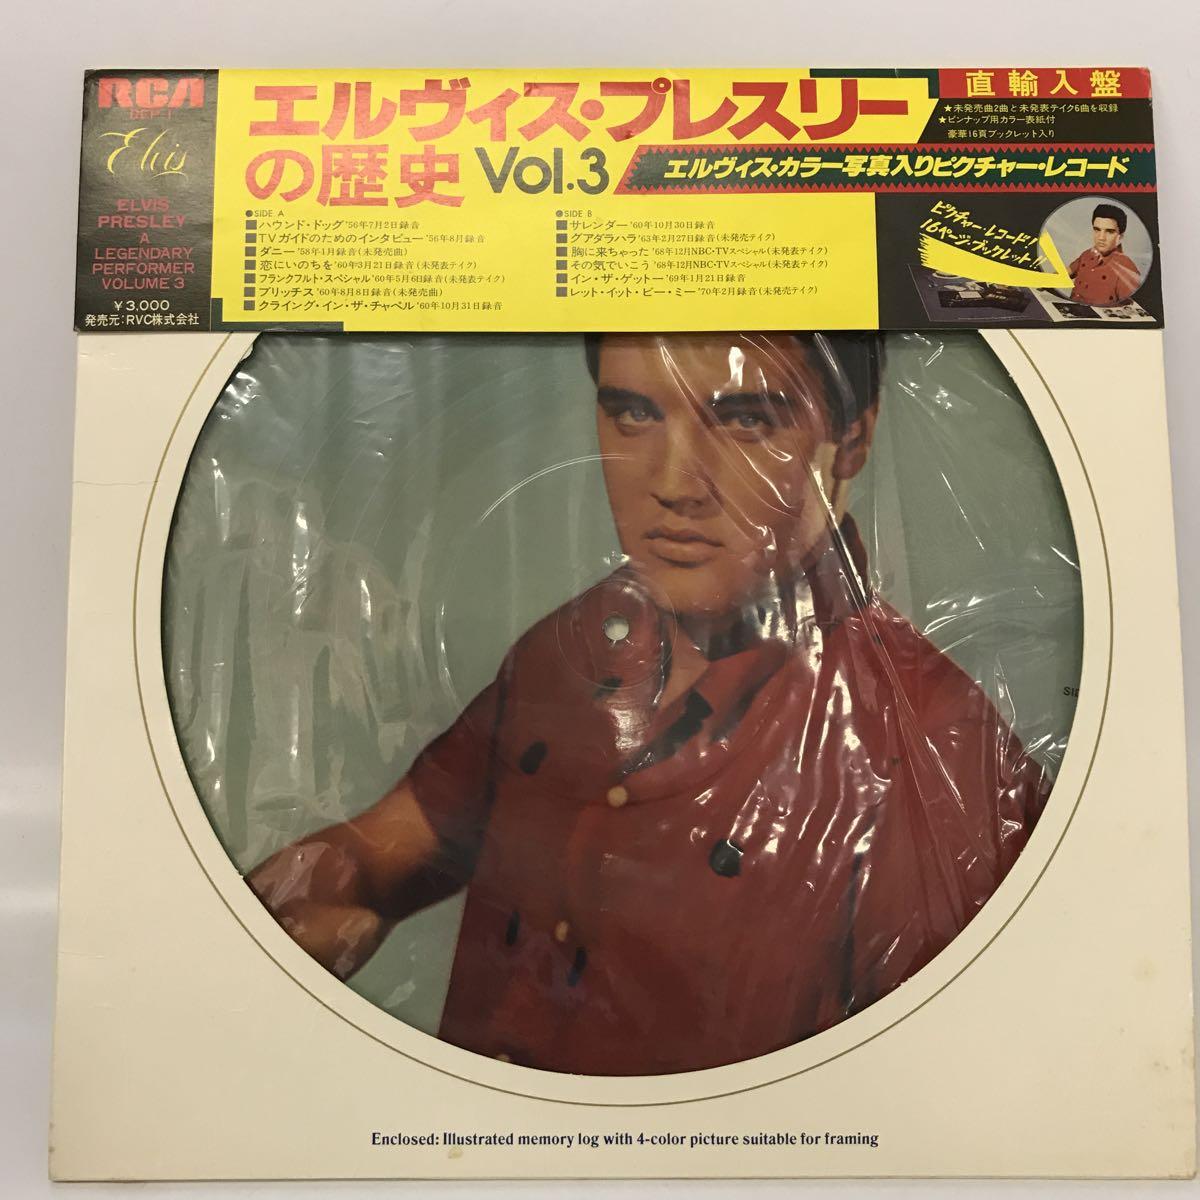 LPレコード アナログ盤 エルヴィスプレスリー ELVIS PRESLEY A LEGENDARY PERFORMER Vol.3 ブックレットなし ピクチャーレコード